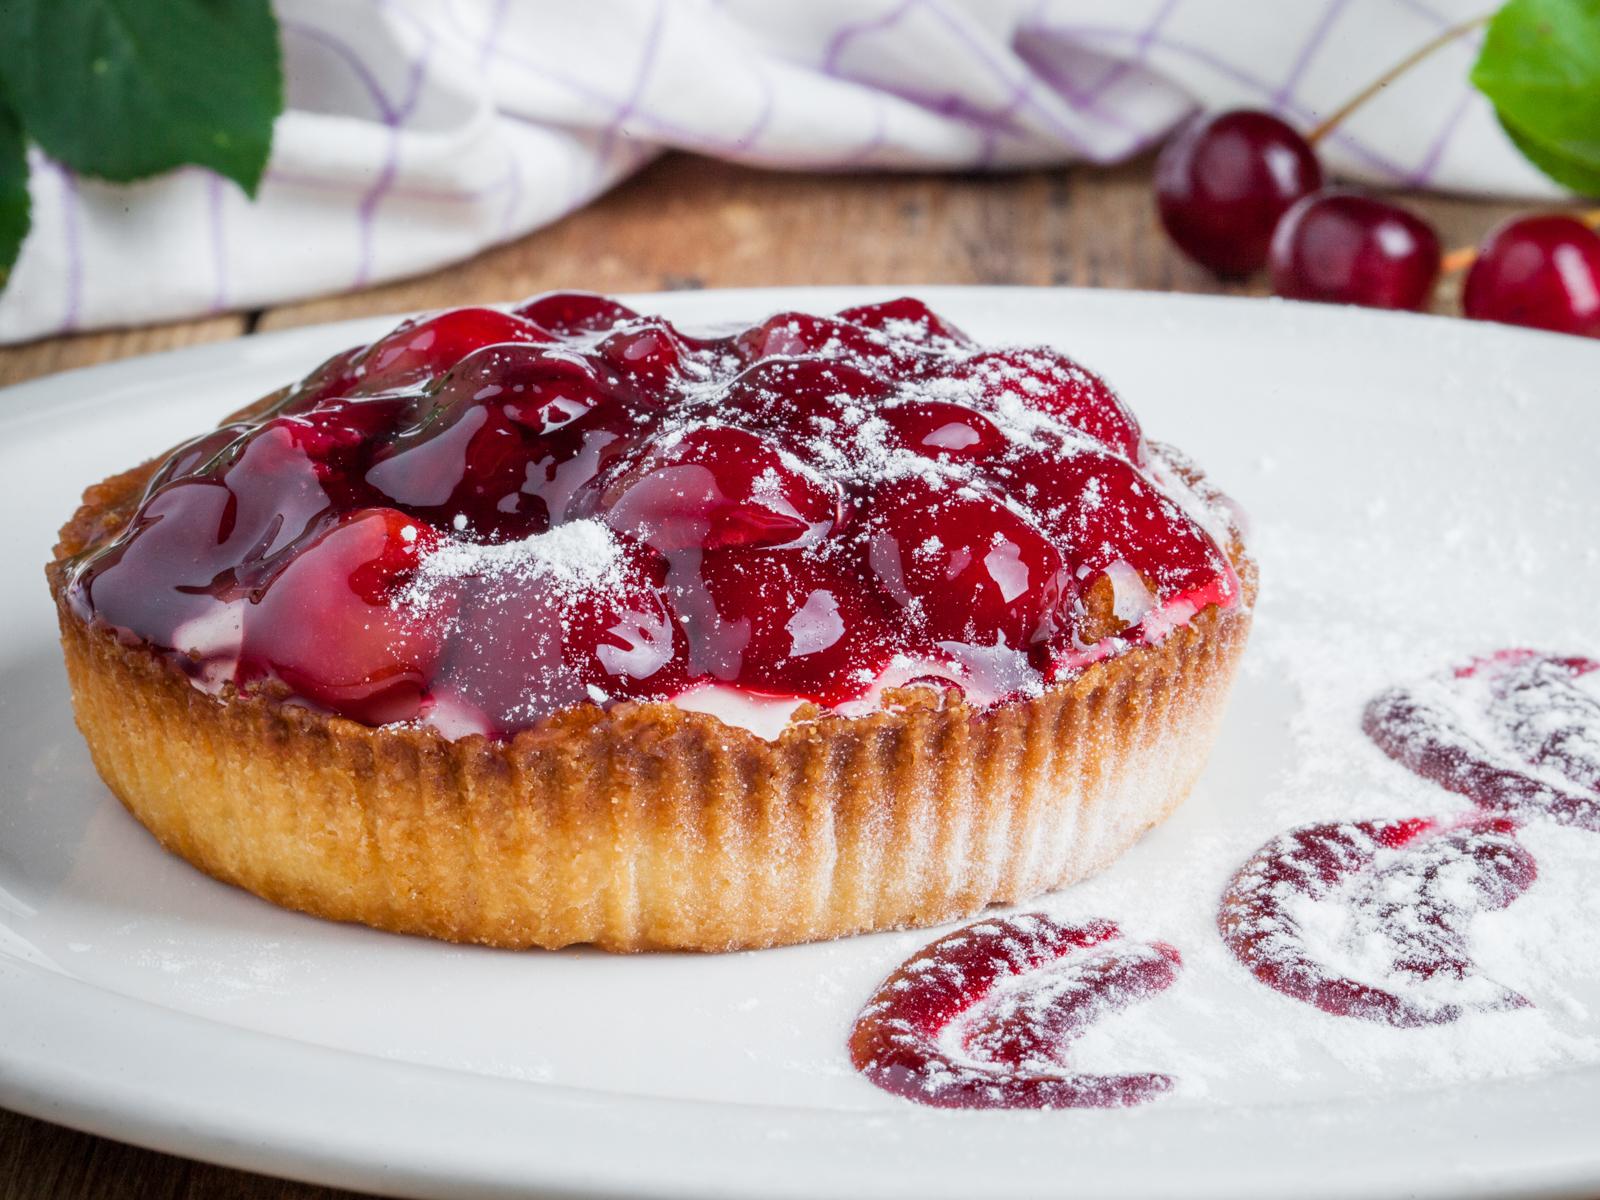 Десерт Кростата с вишней